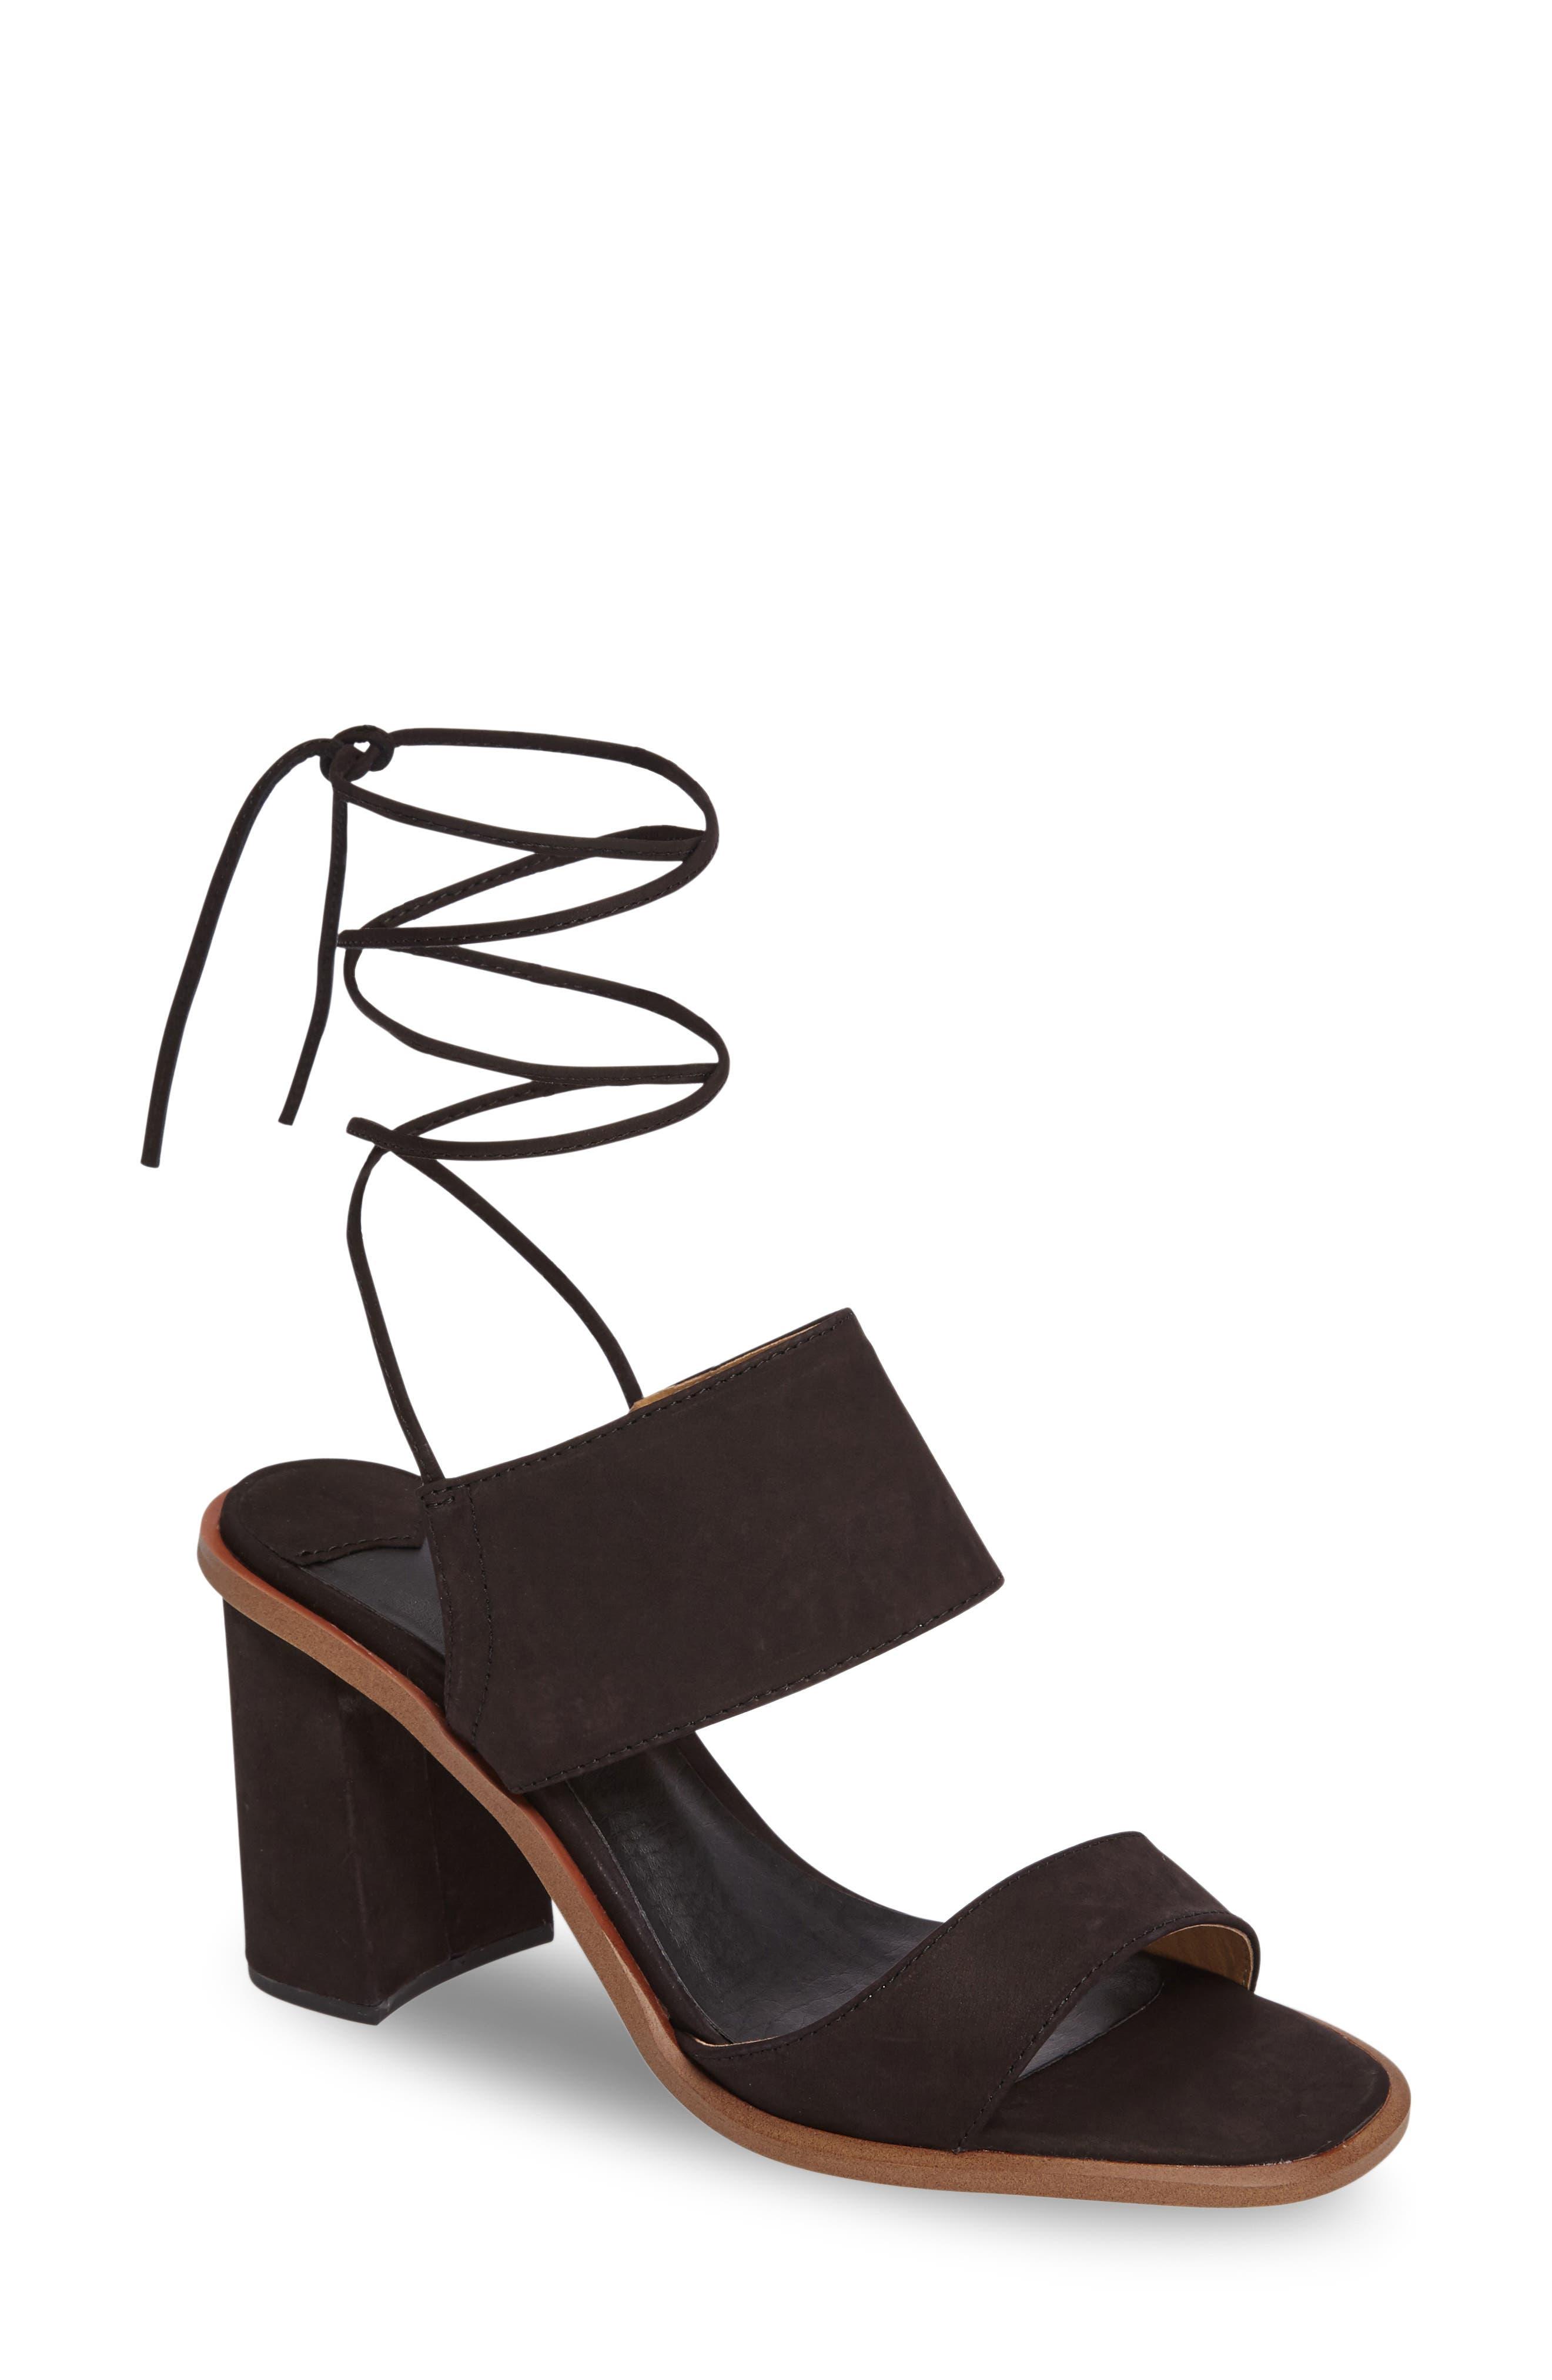 Cuoco Ankle Strap Sandal,                         Main,                         color, 001